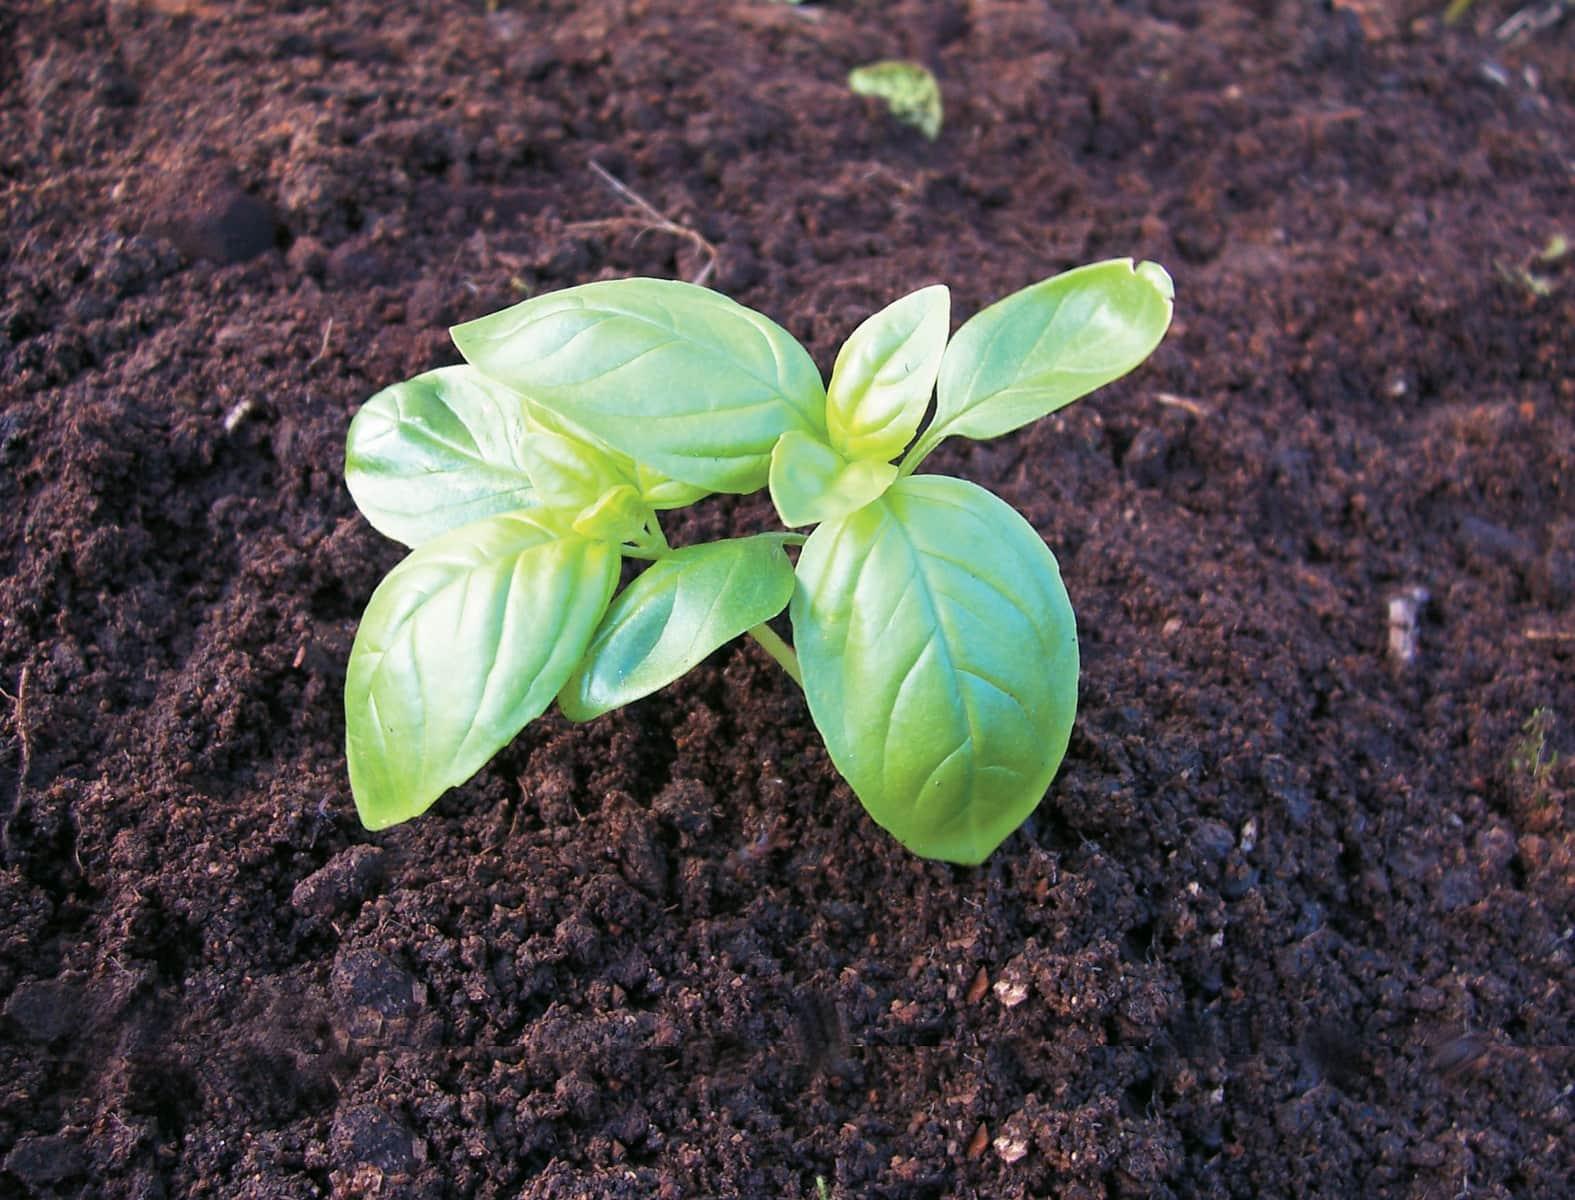 Edible Garden Growing Basil Healthy Food Guide